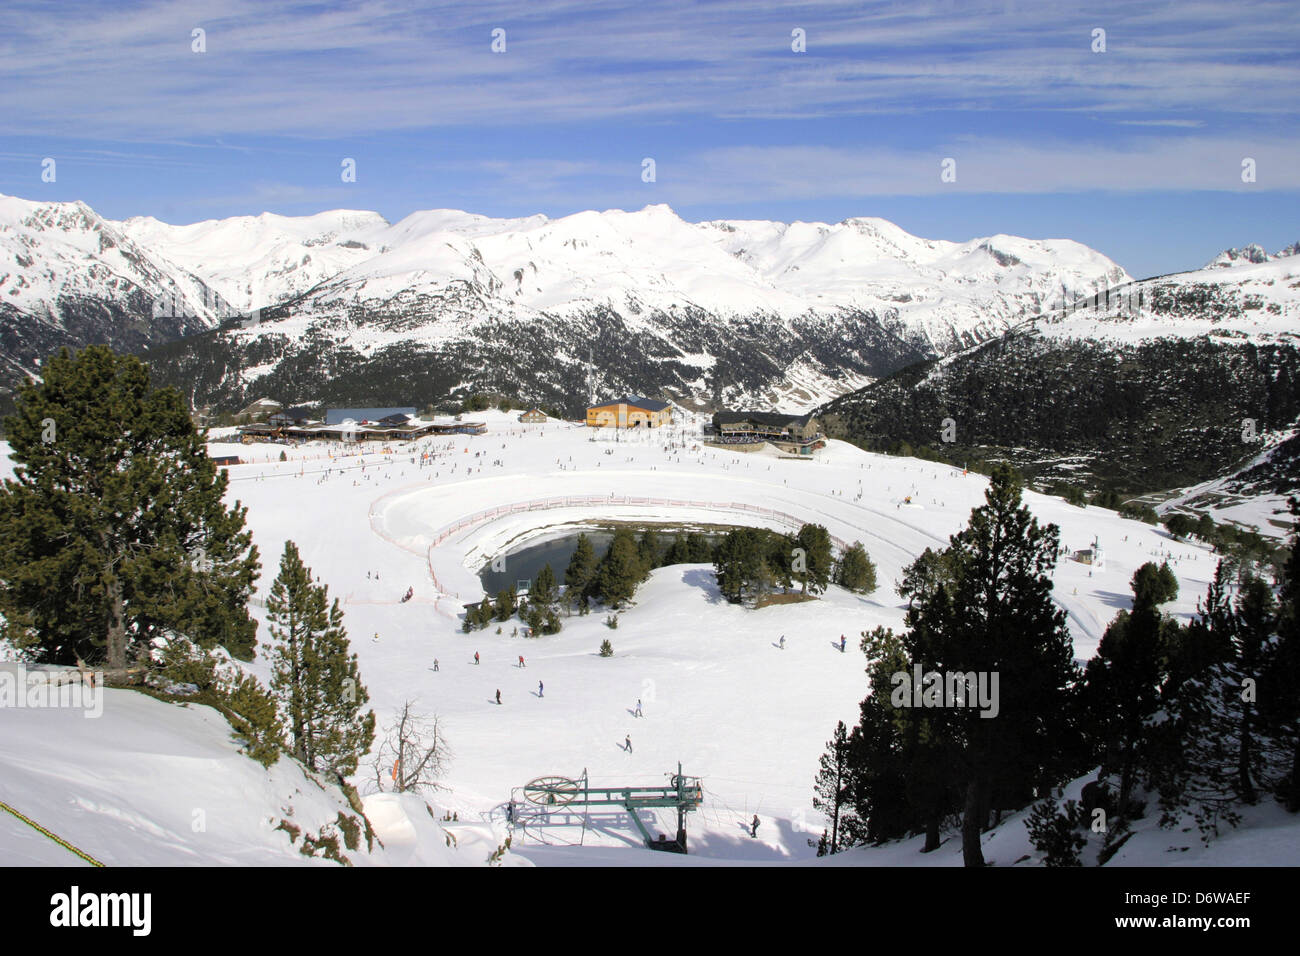 andorra, soldeu, view of ski resort stock photo: 55876087 - alamy